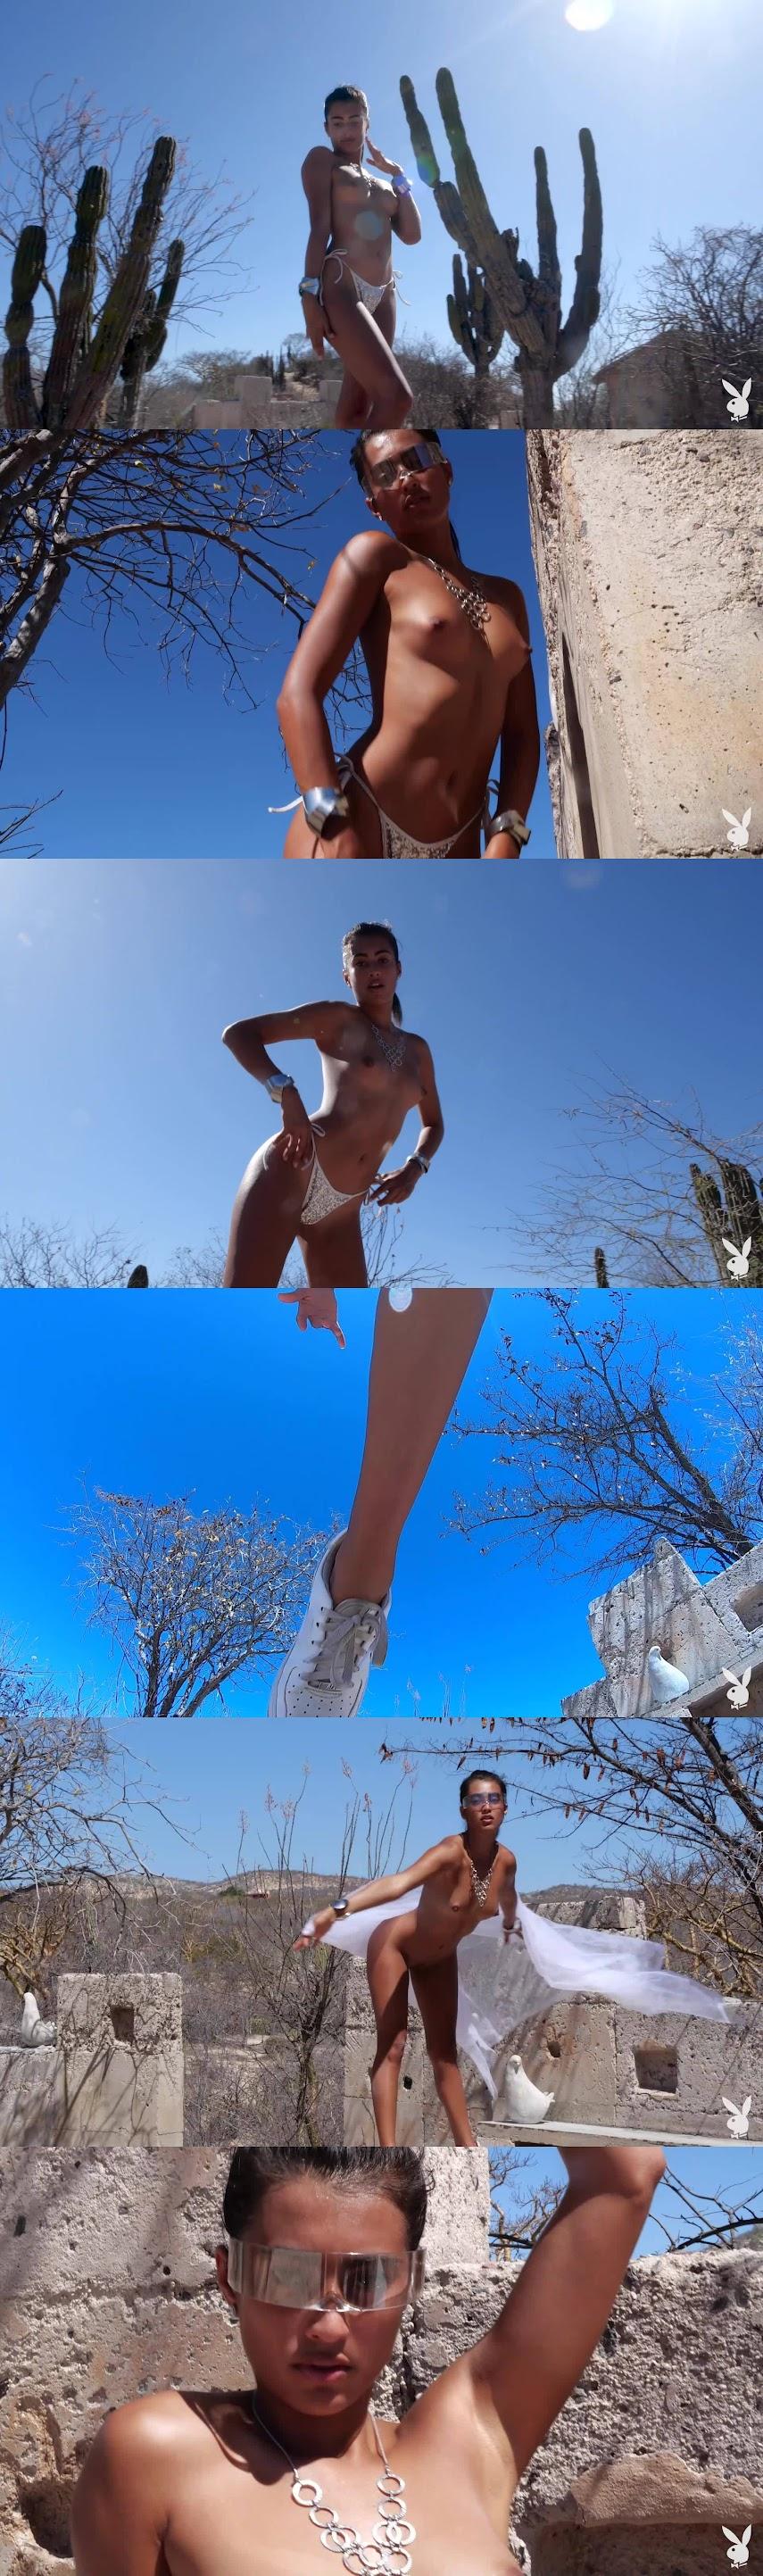 1634310467_katherinne73_0021 1-[Playboy Plus] Katherinne Sofia in Silver Sun playboy-plus 10190